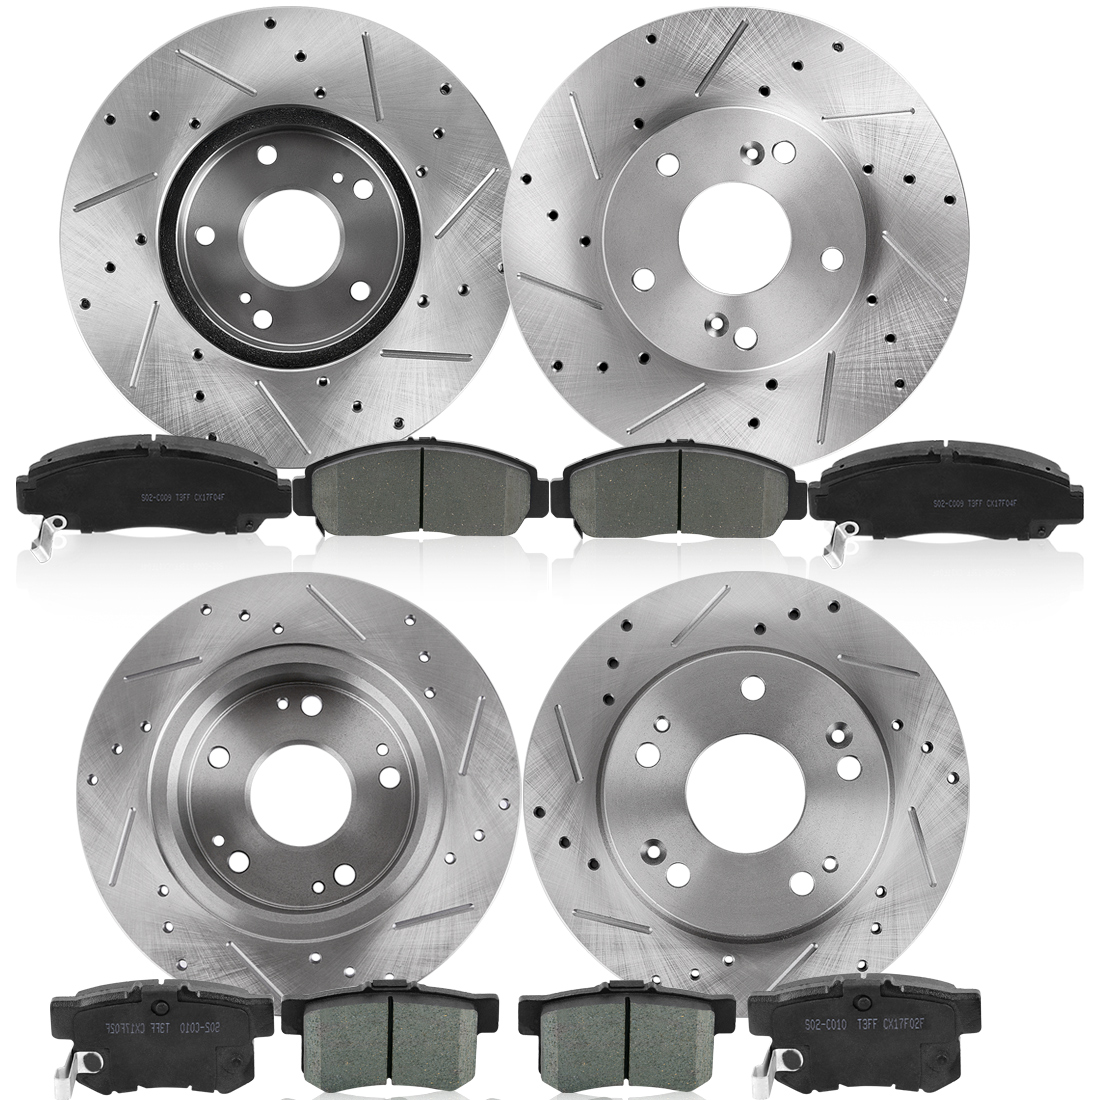 For 2003-2007 Honda Accord Rear Black Drilled Brake Rotors Replacement Parts Brake System Ceramic Brake Pads